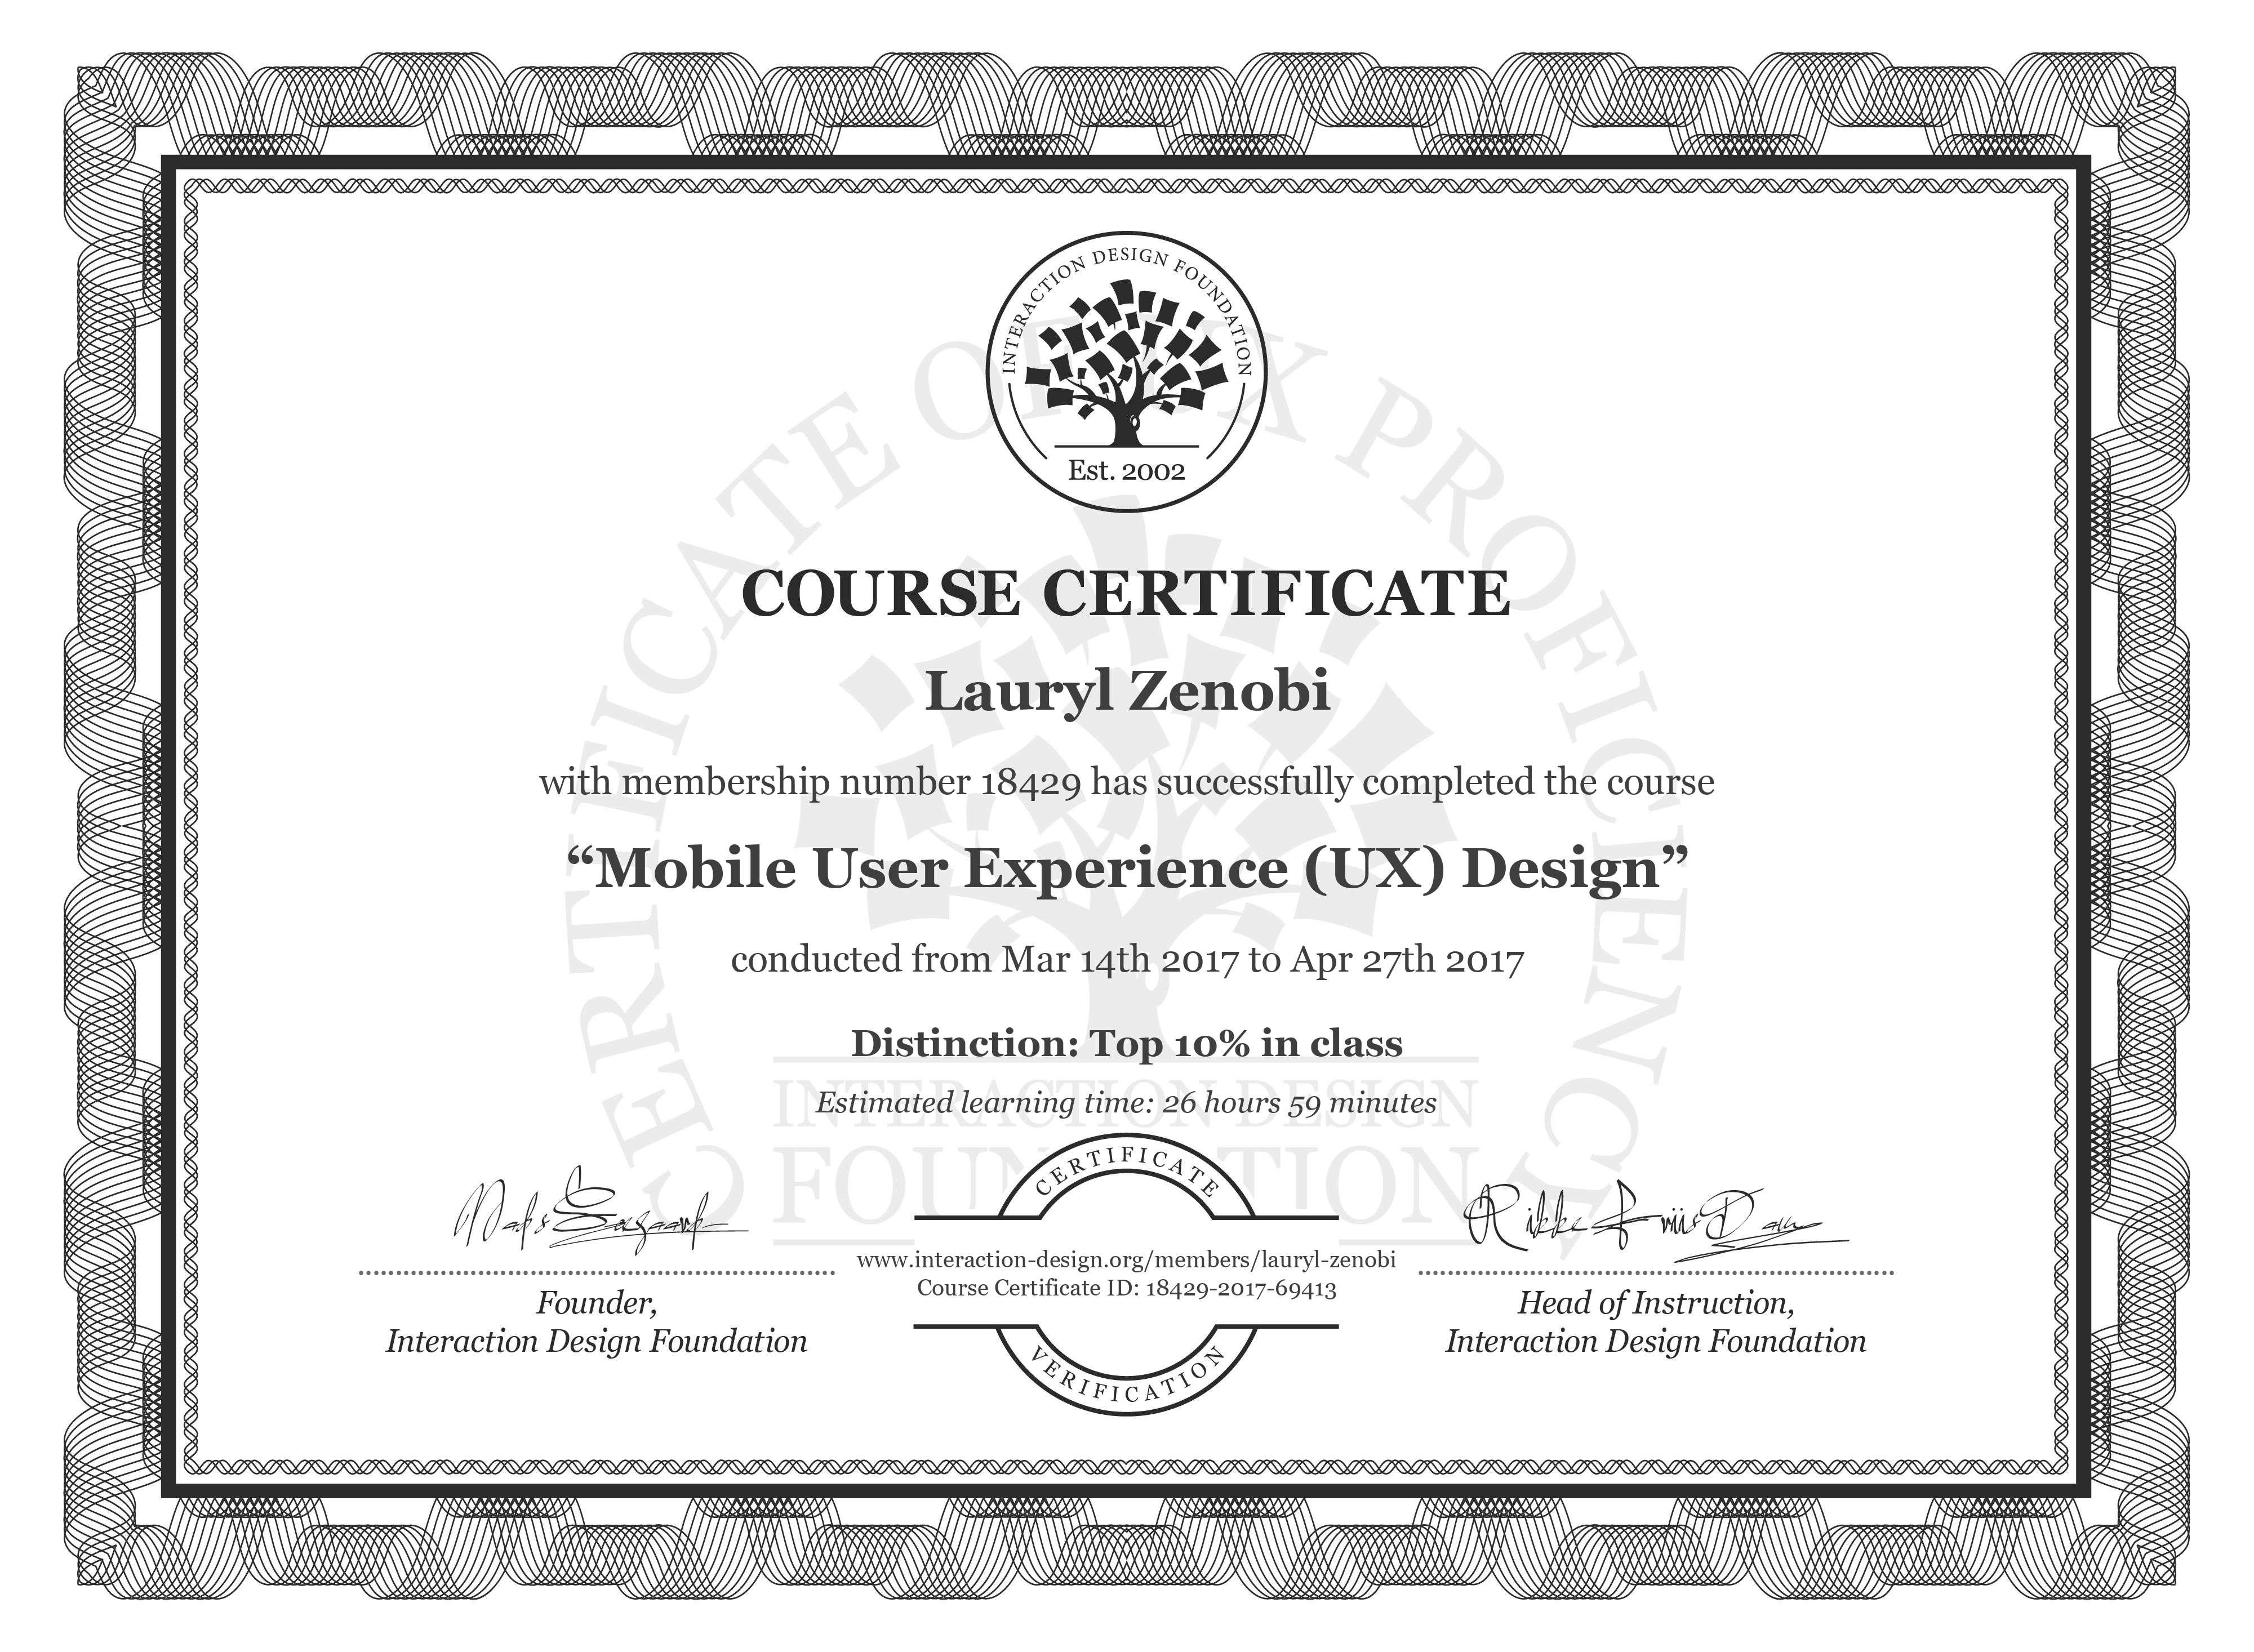 Lauryl Zenobi's Course Certificate: Mobile User Experience (UX) Design